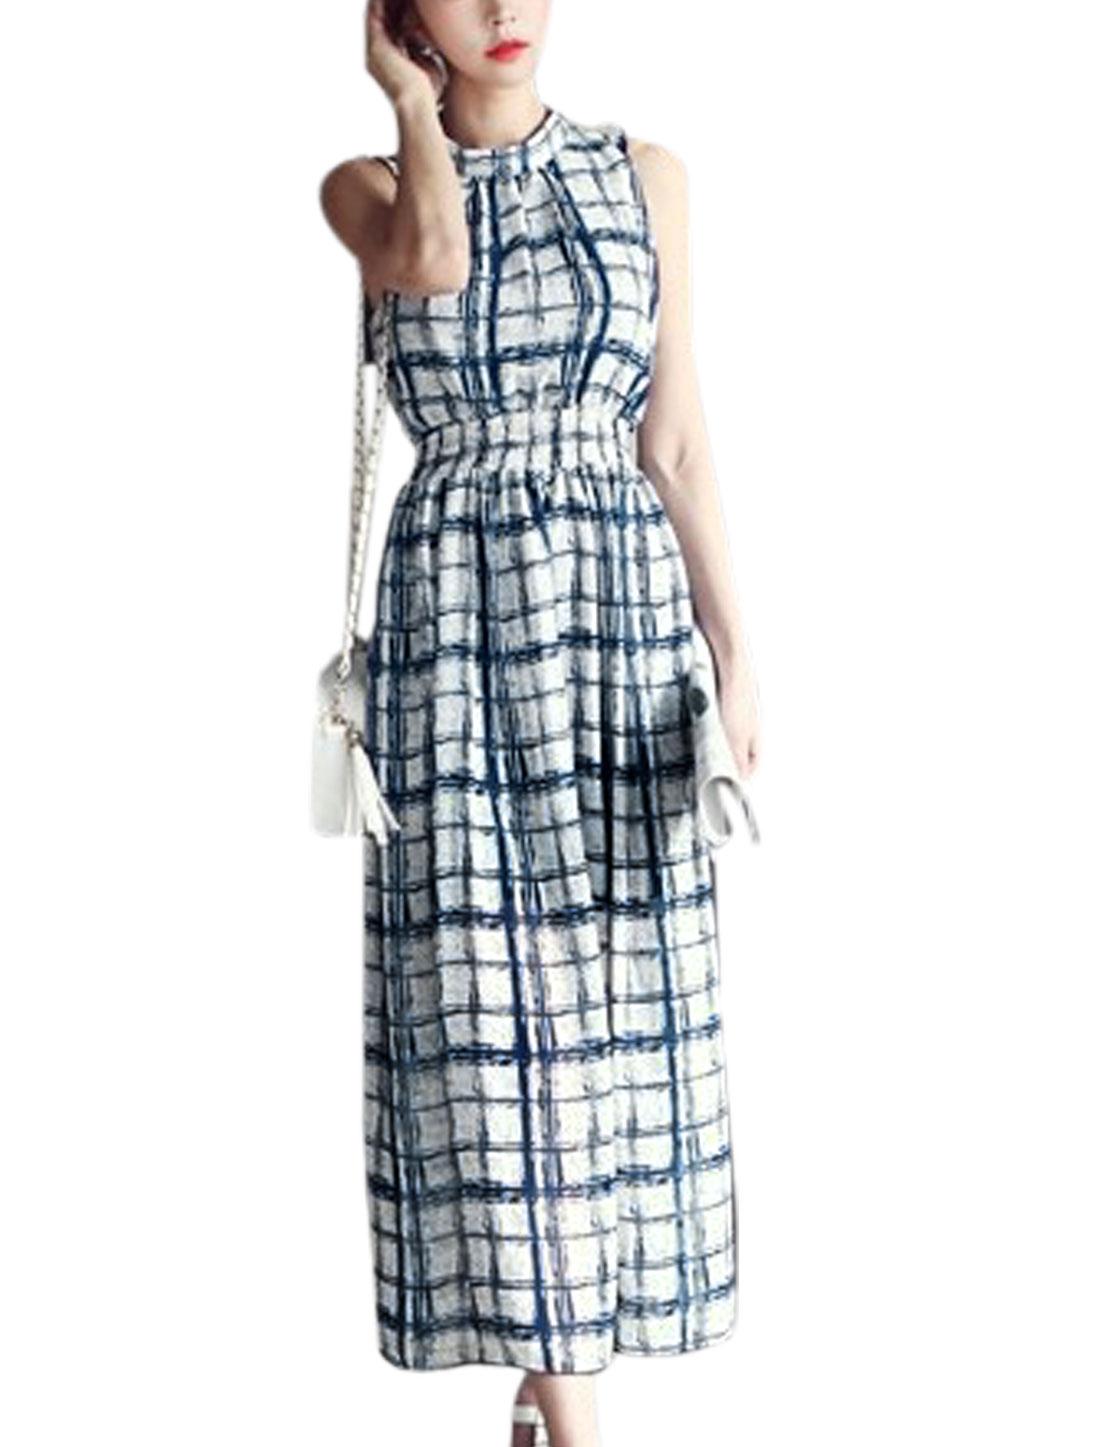 Women Stand Collar Check Pattern Elegant Chiffon Tank Dress Navy Blue White XS